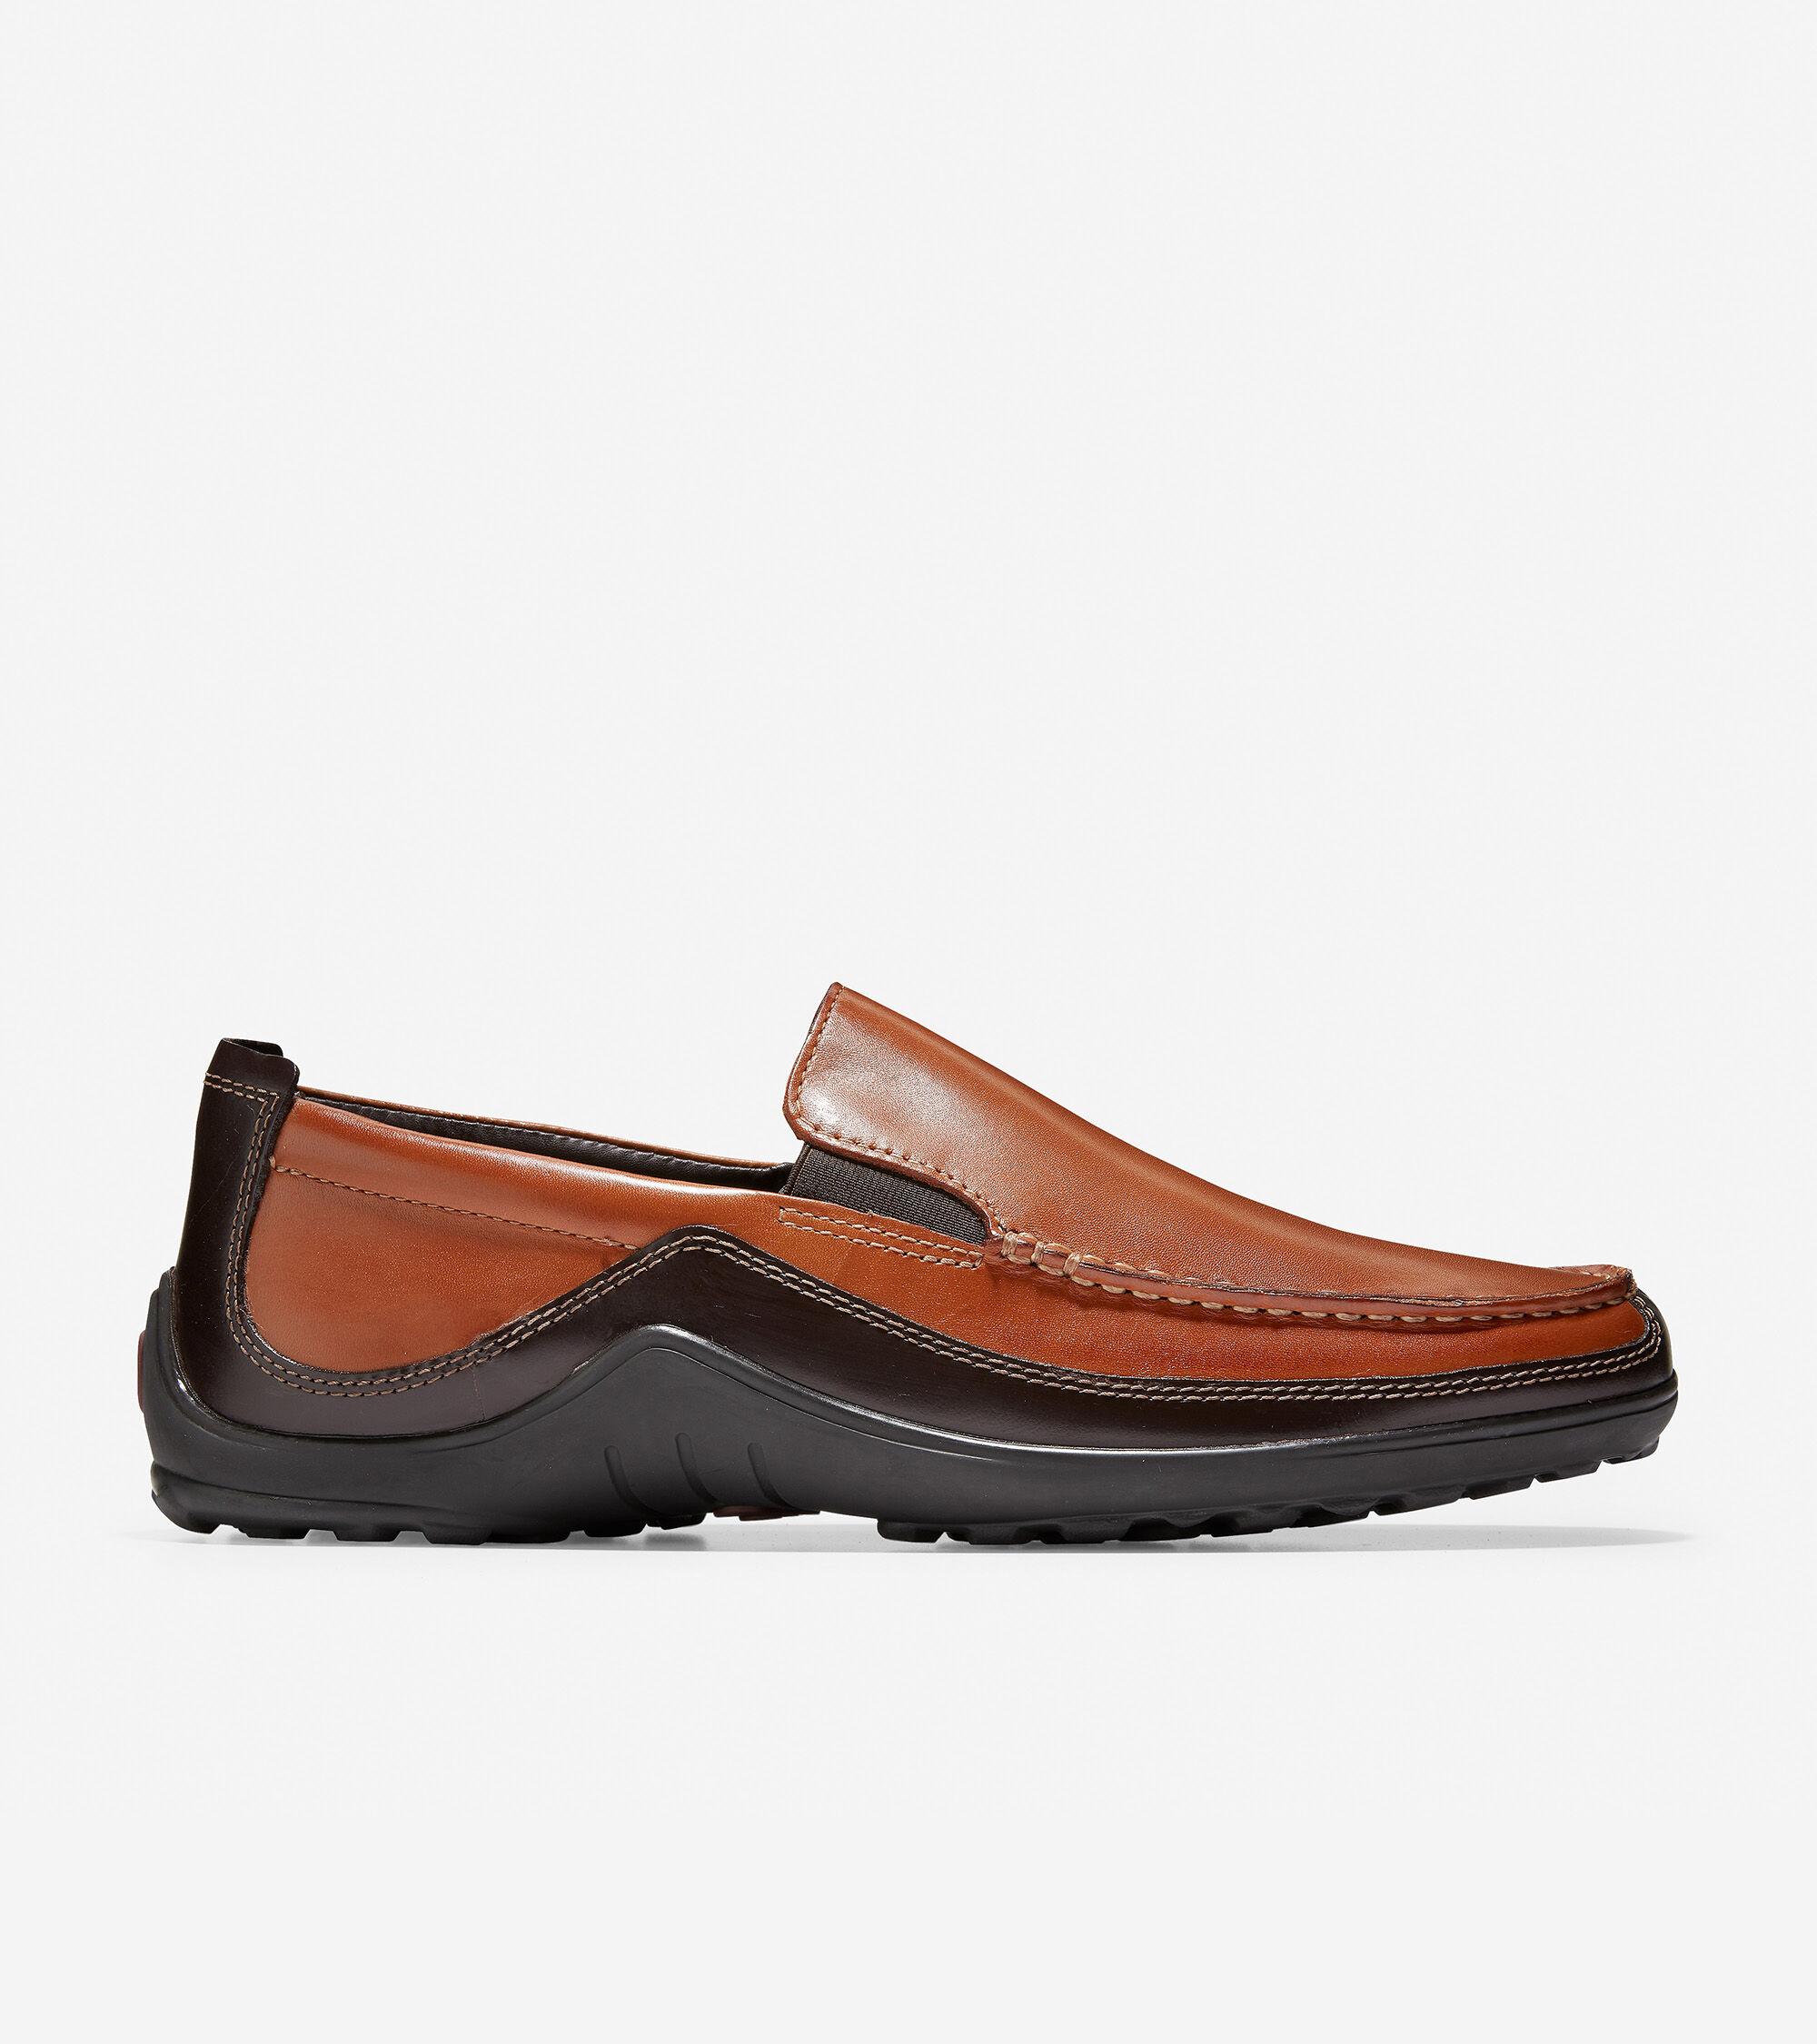 0db1e59803d Tucker Venetian Loafers in Tan   Mens Shoes